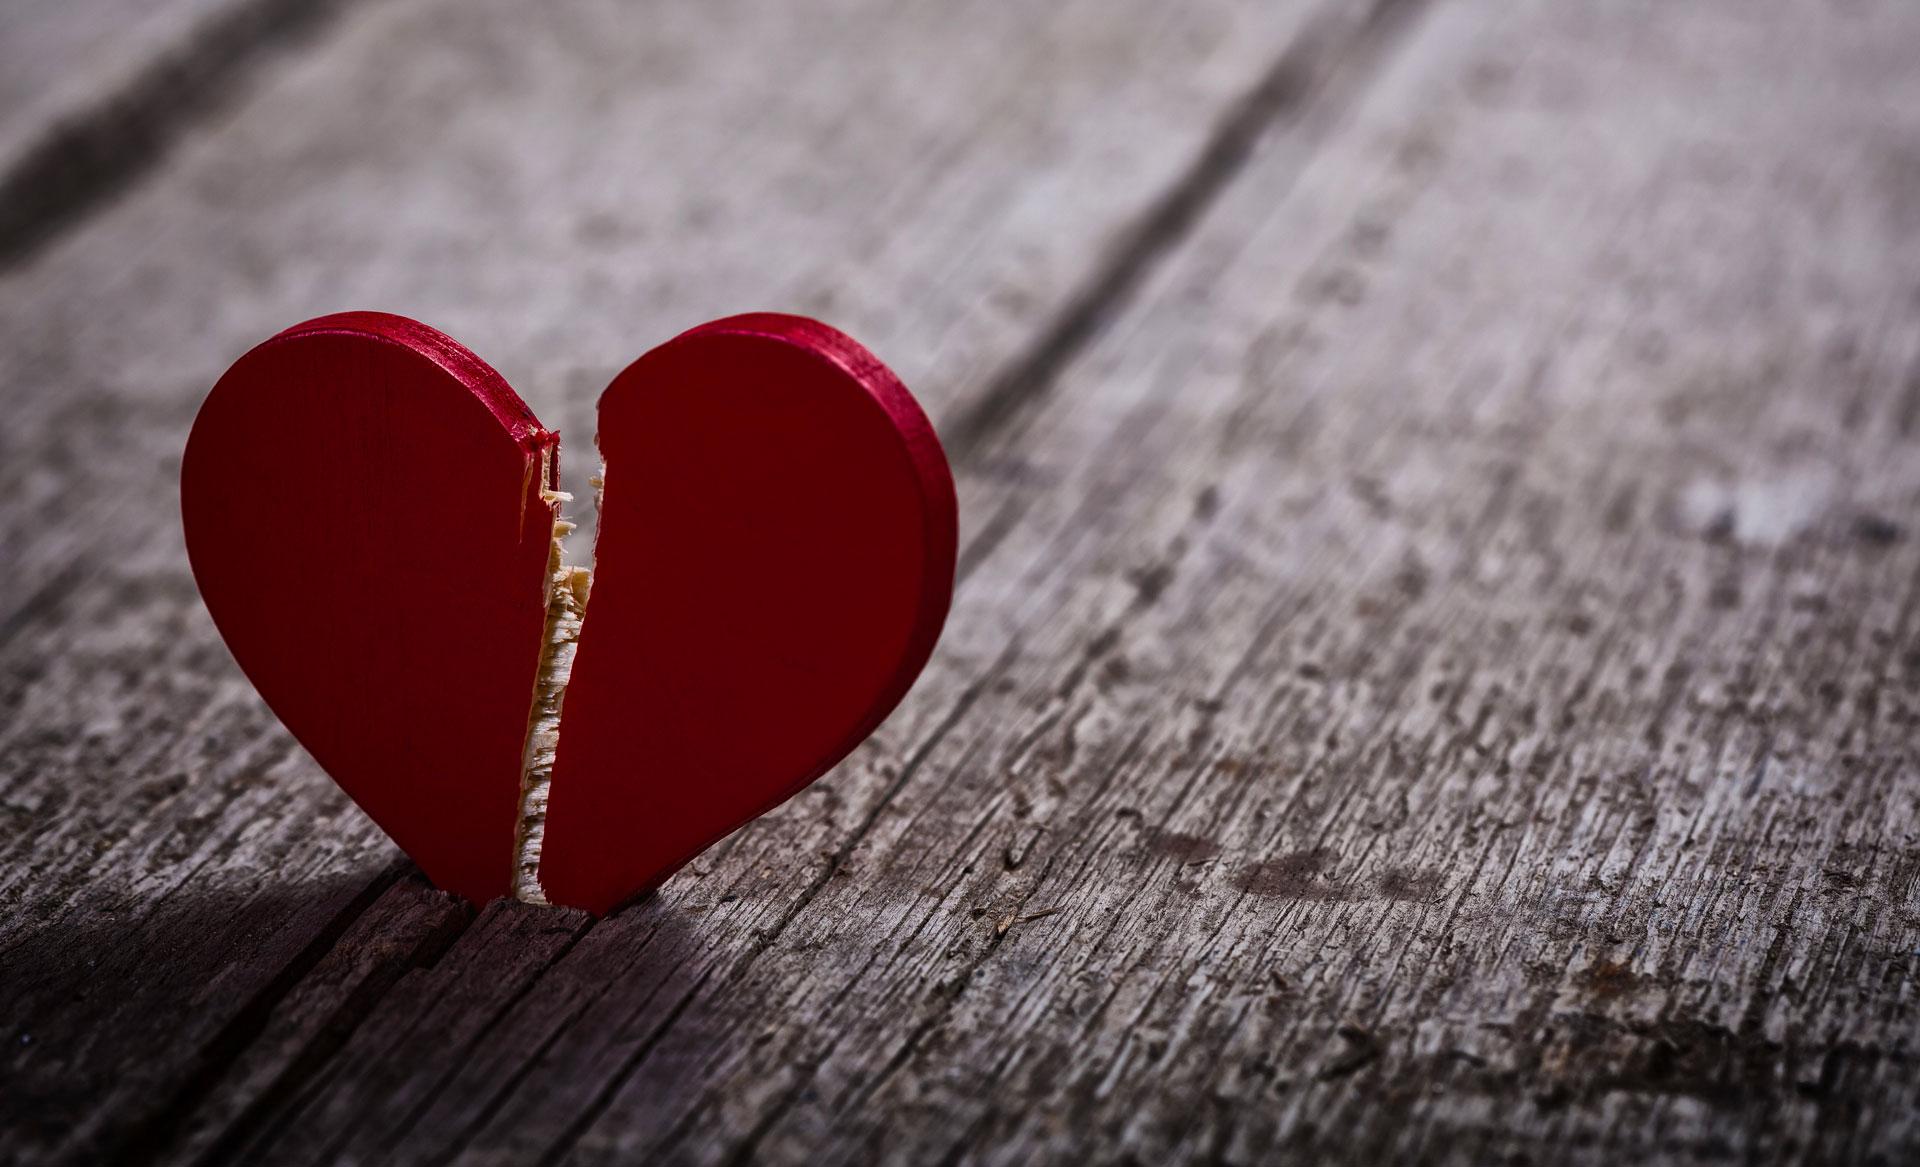 5 pop songs to get you through your heartbreak